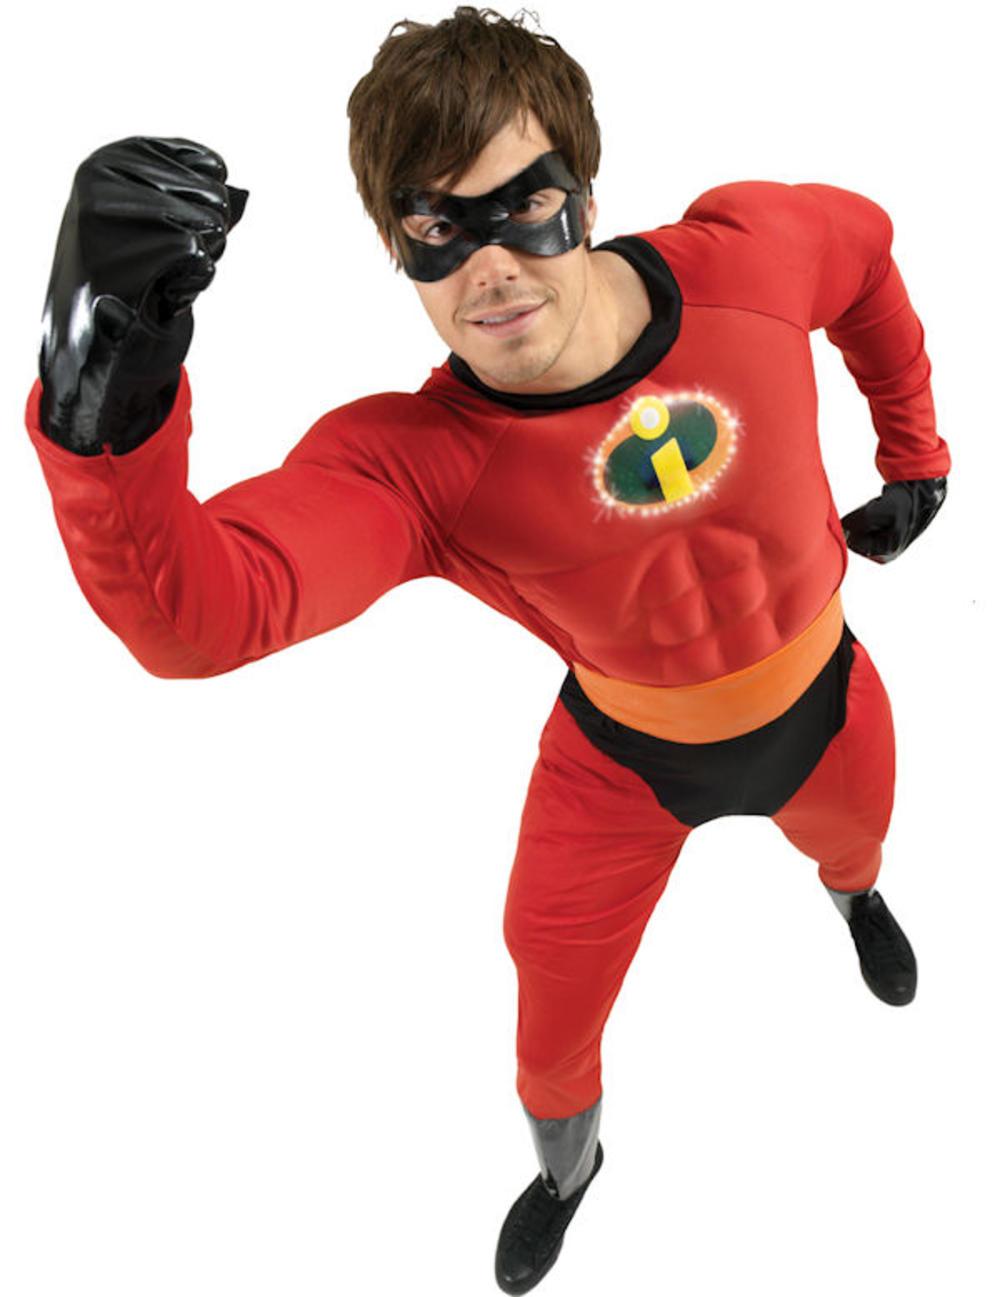 Mr Incredible Mens Fancy Dress Disney's The Incredibles Superhero Costume Outfit